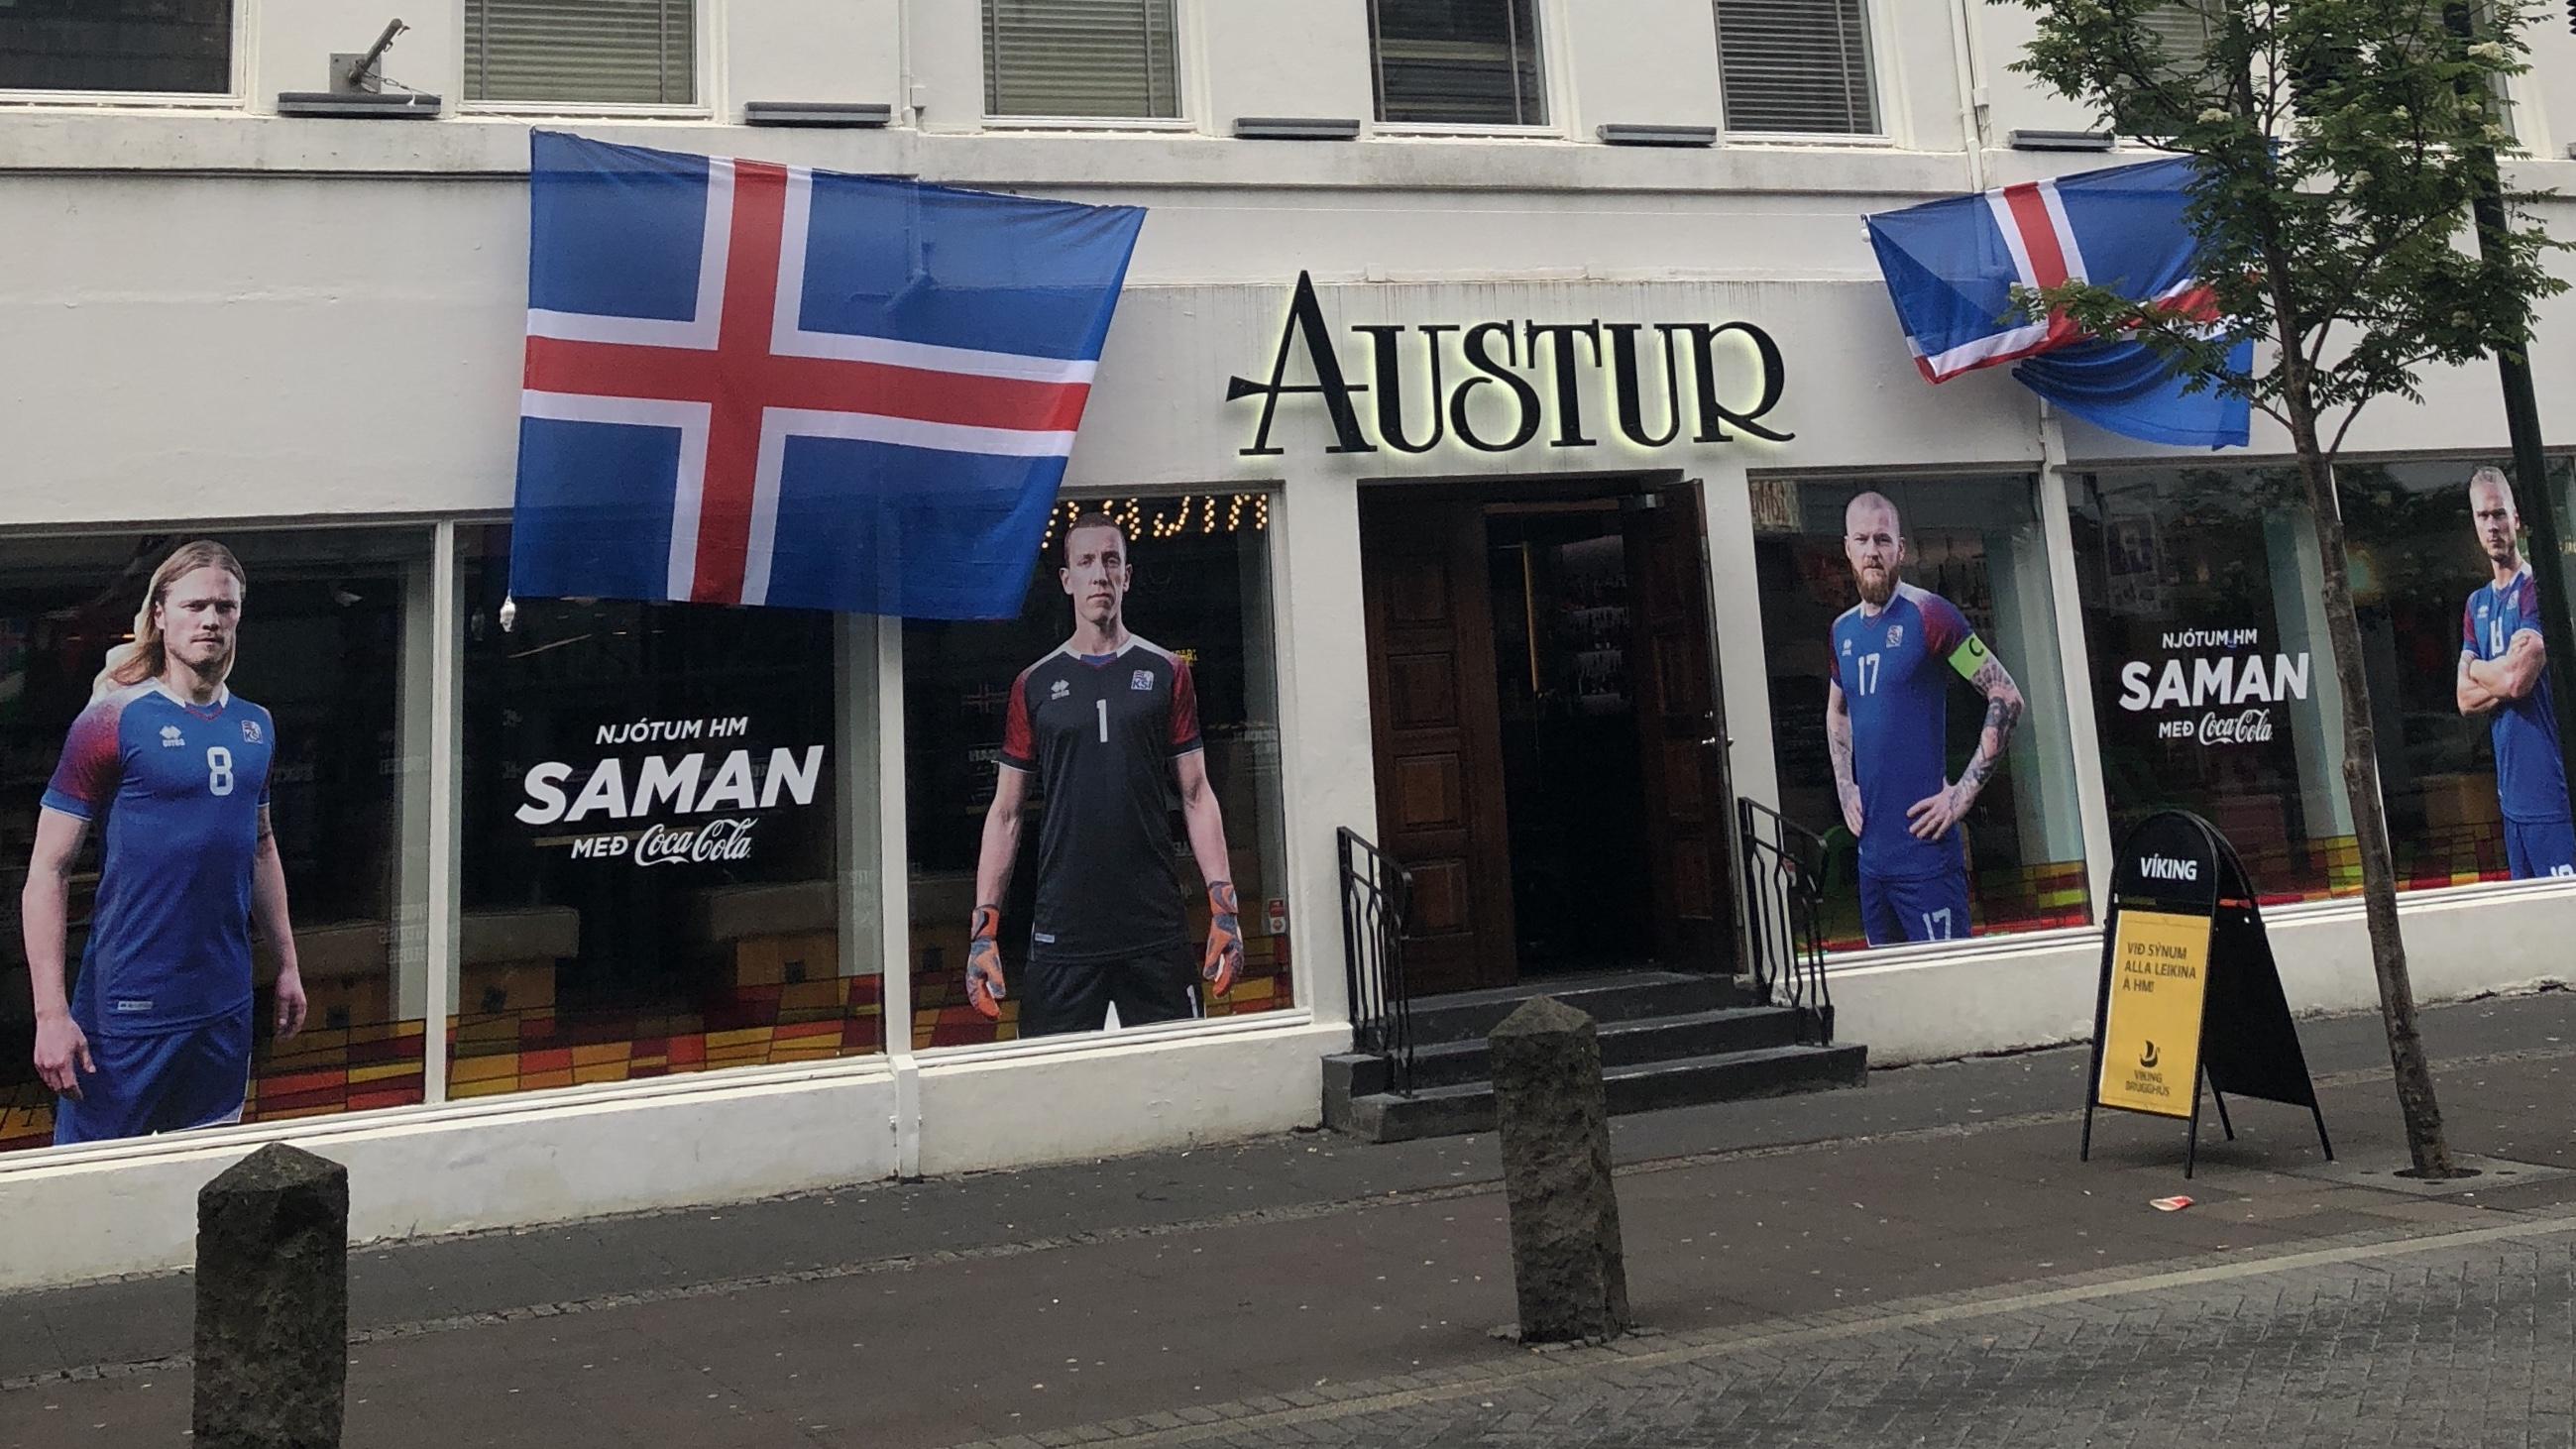 Islanda 2018 - giocatori nazionale foto strade Reykjavik